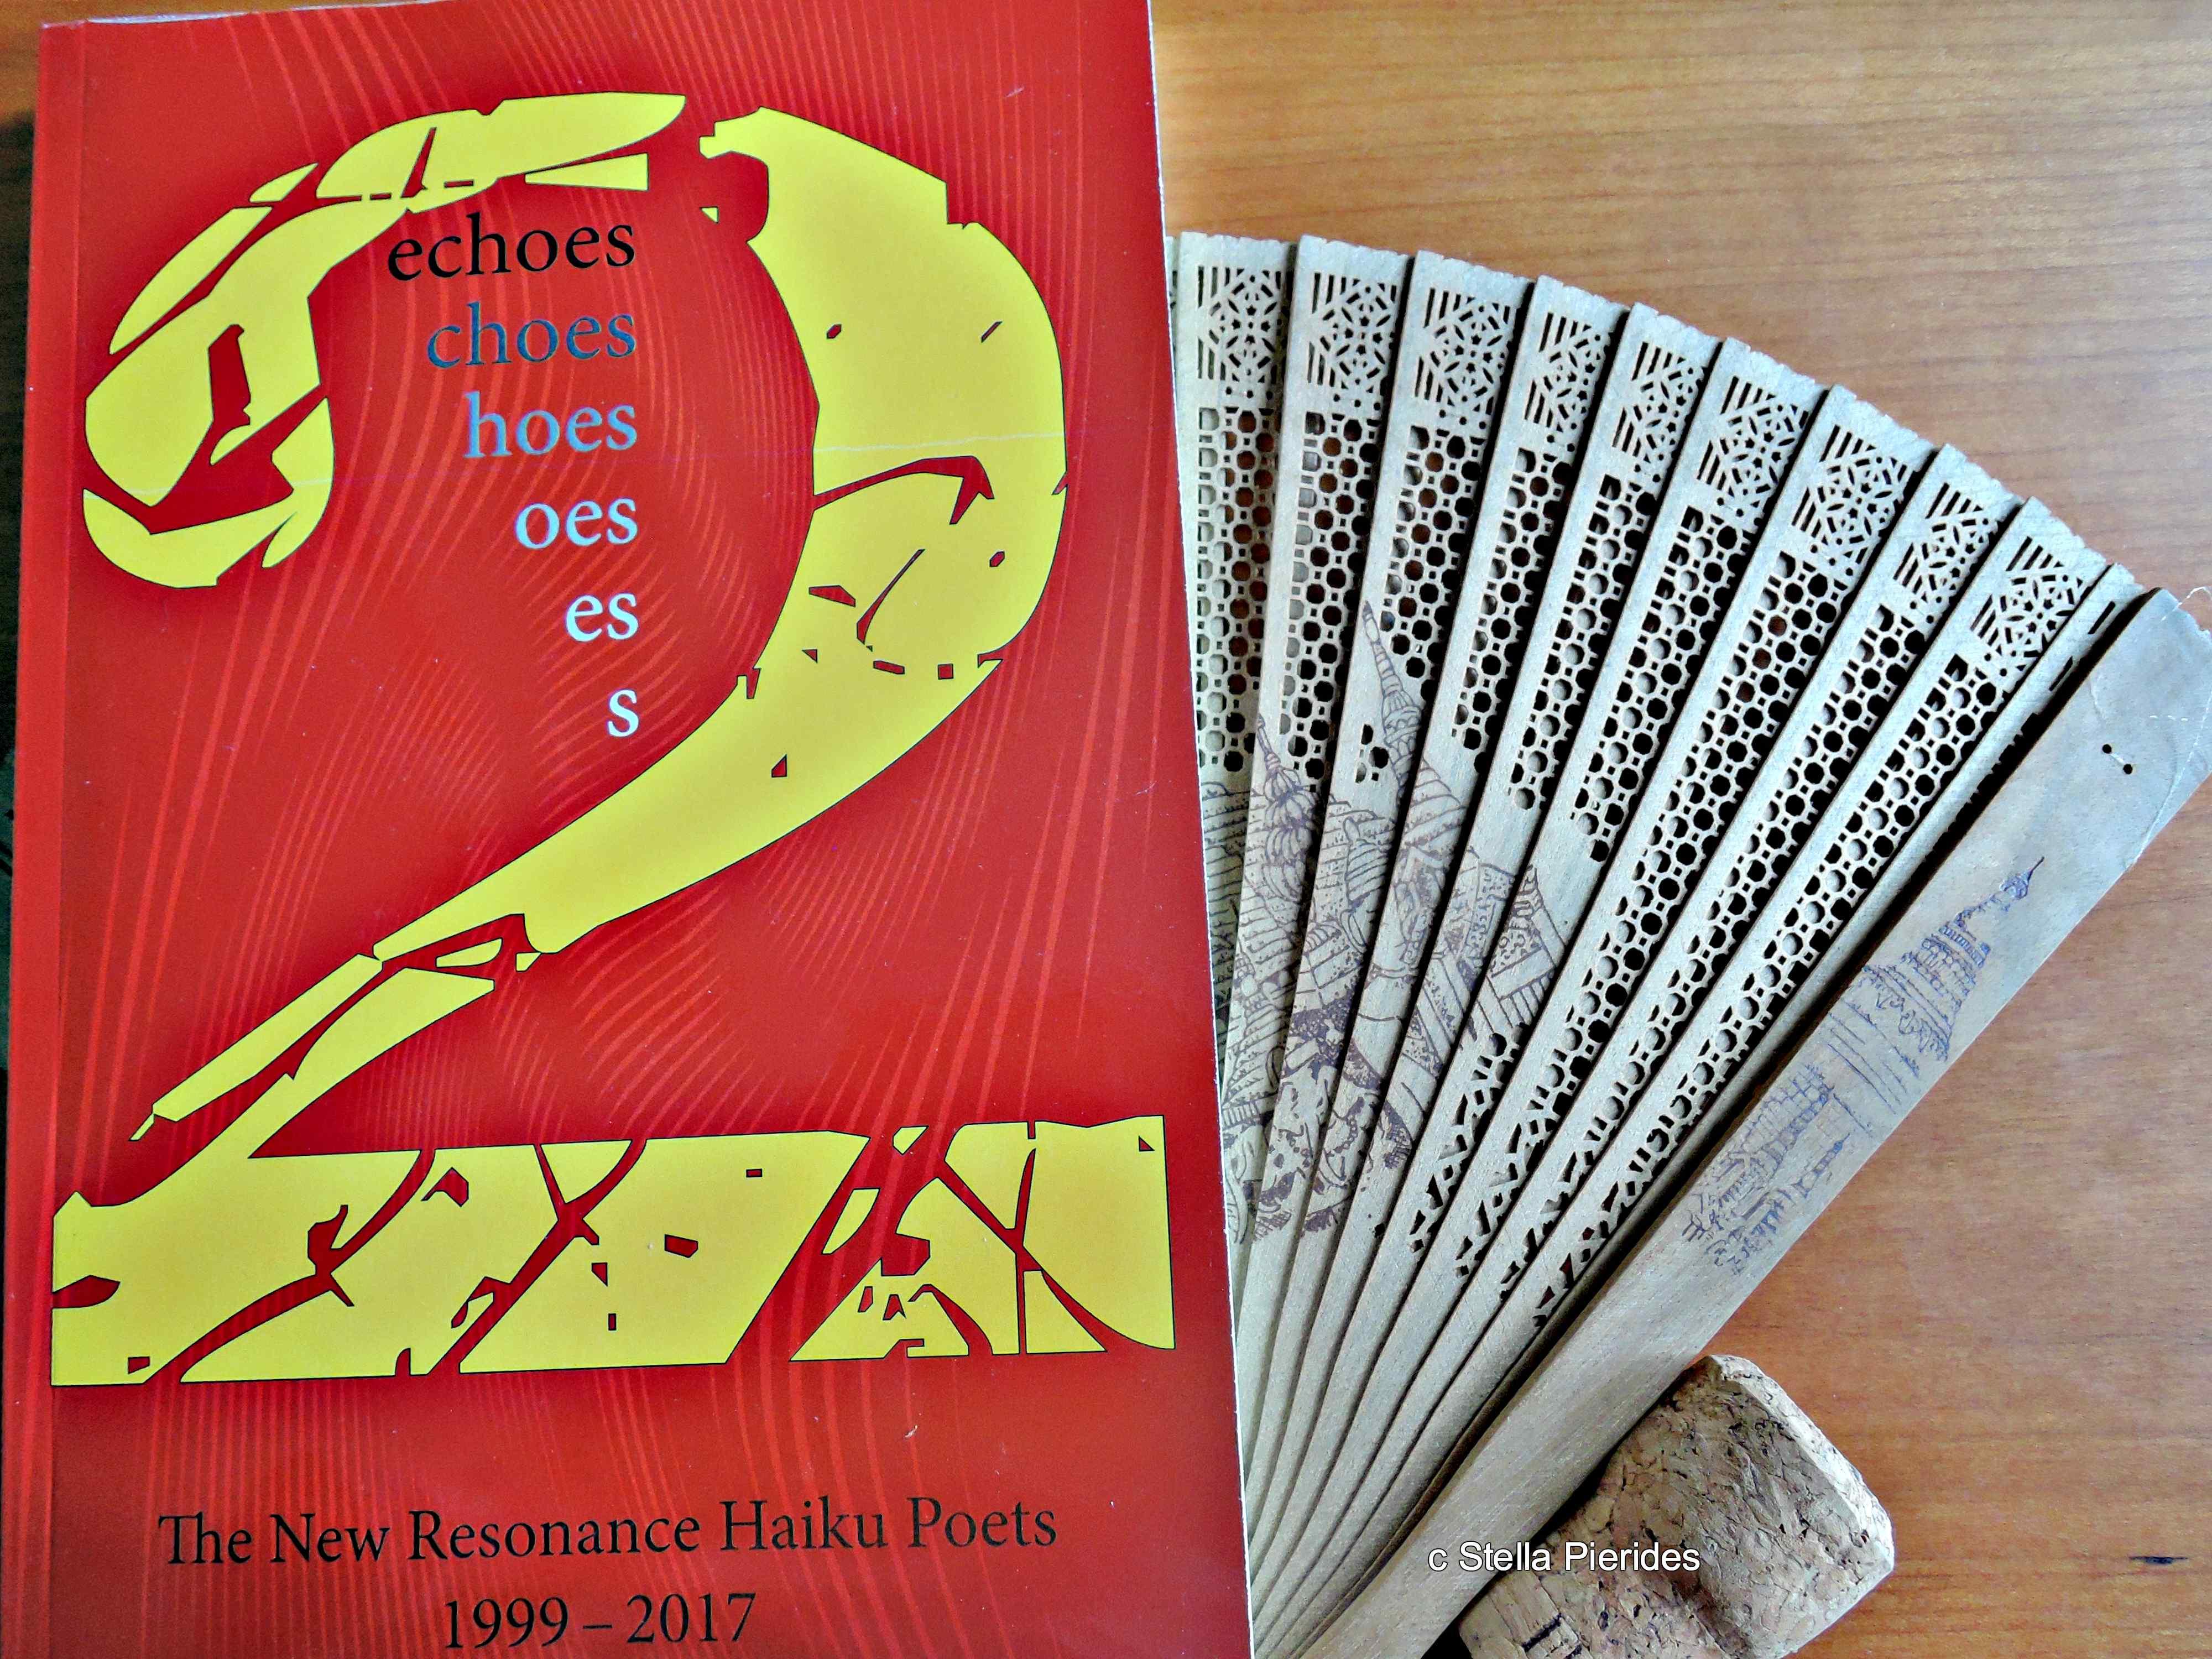 Echoes 2,haiku community,